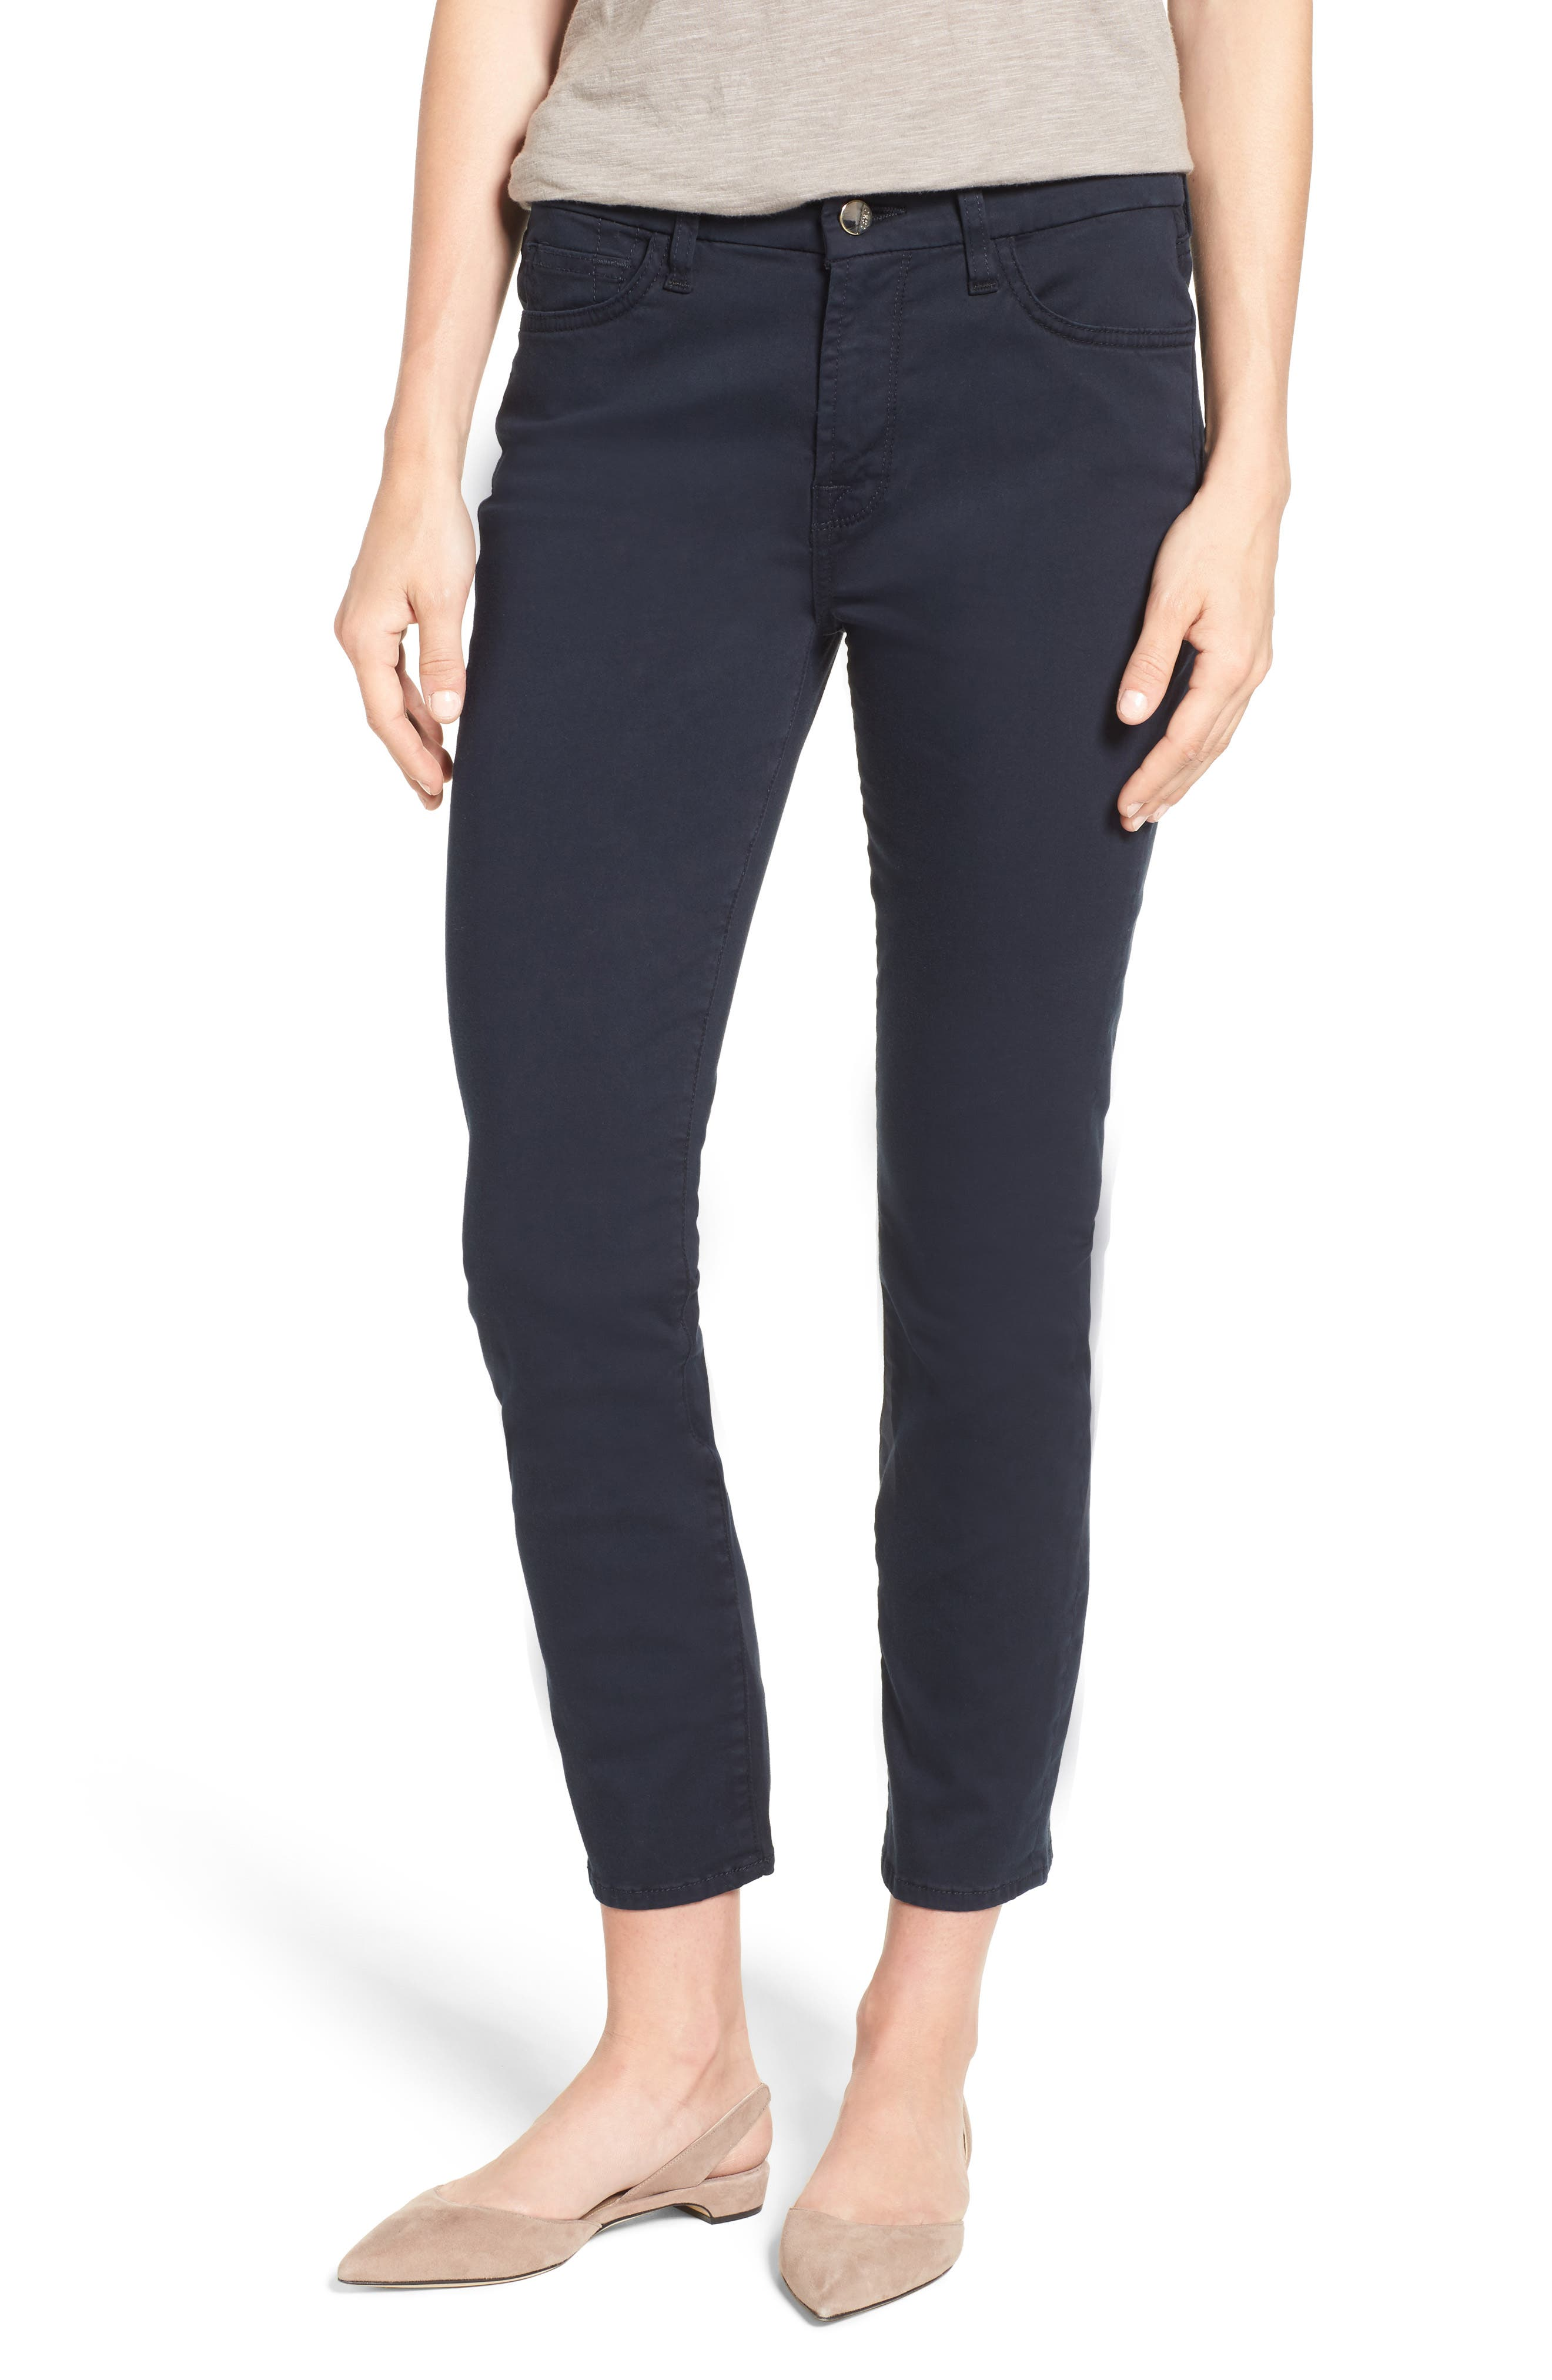 Jen7 Colored Stretch Ankle Skinny Jeans